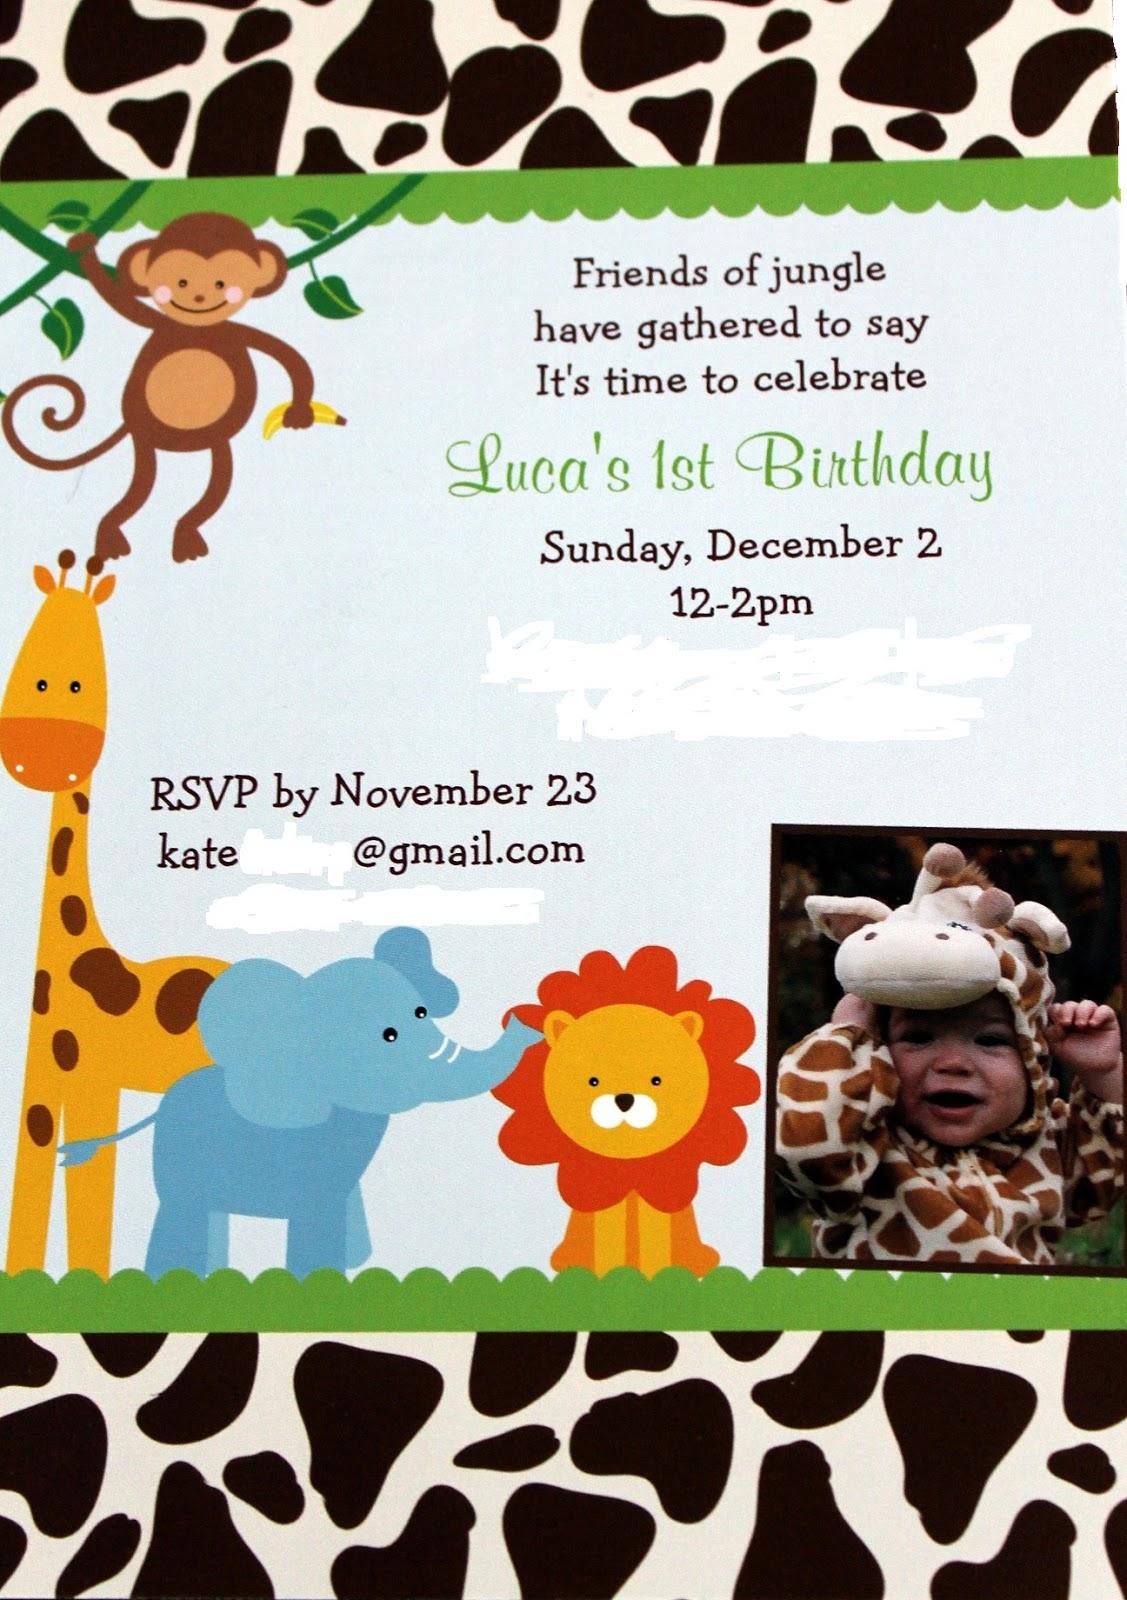 Life with Luca: Luca's safari first birthday!